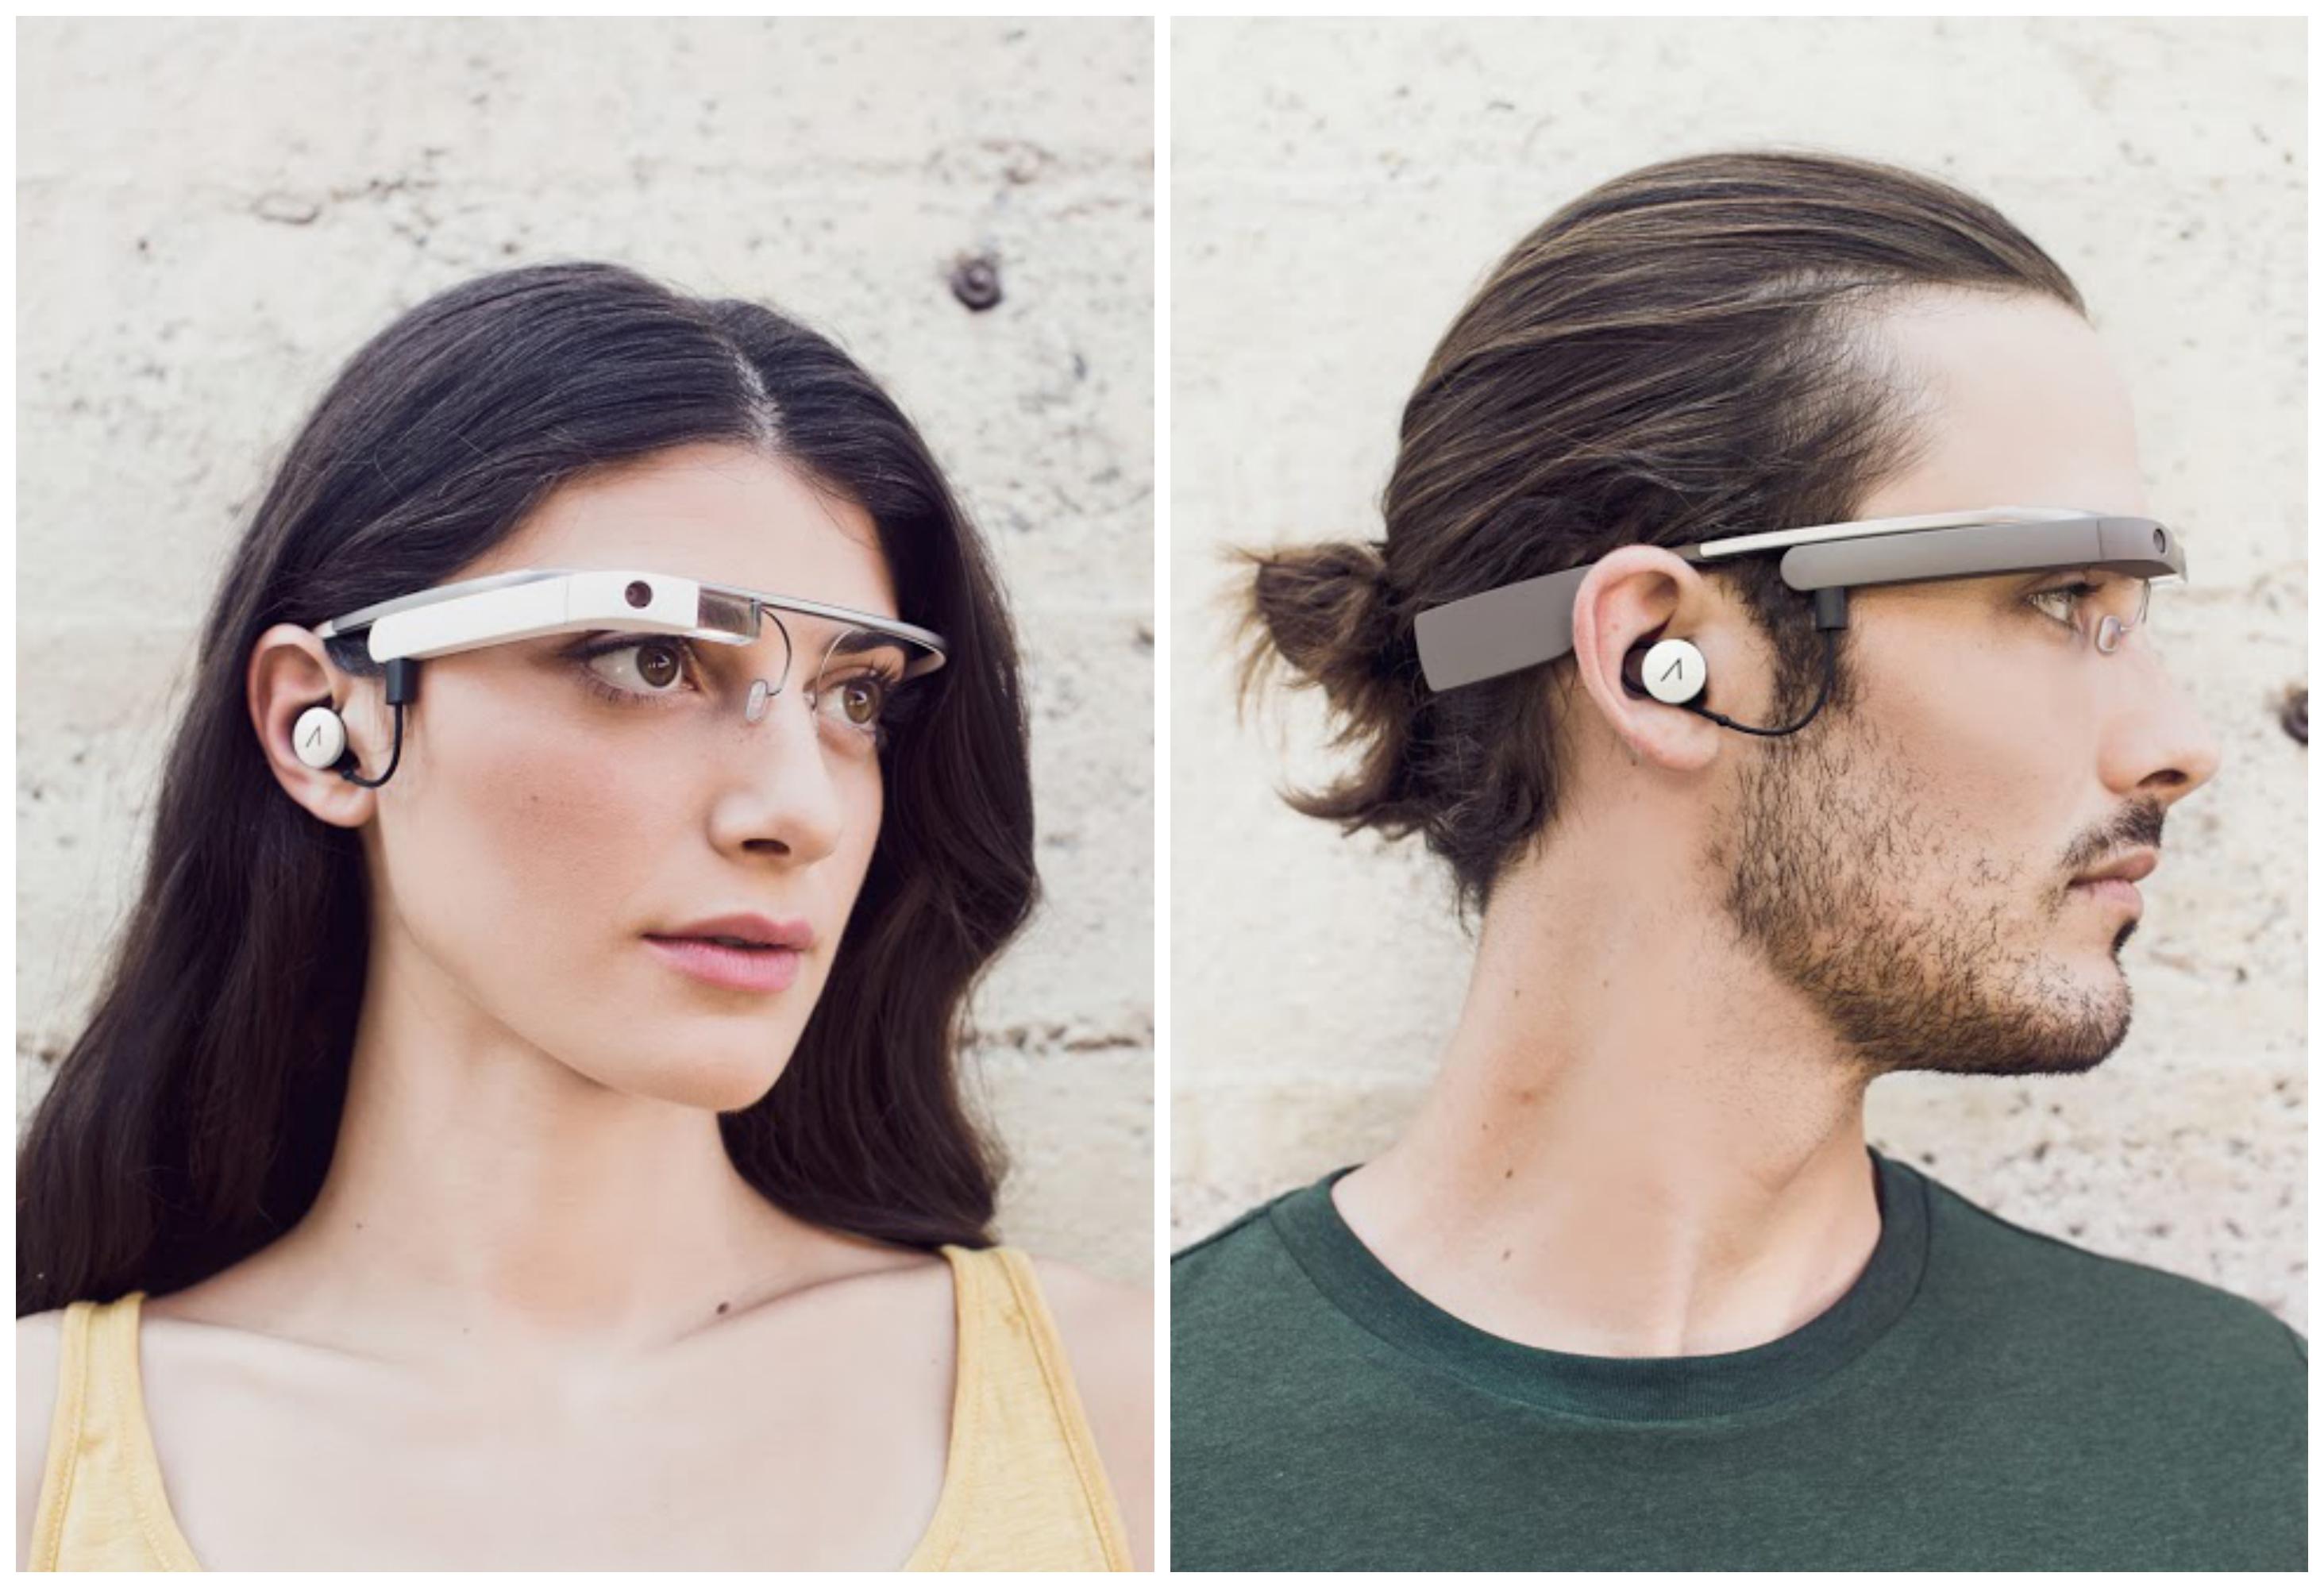 Google Glass voegt Play Music toe, muziek luisteren met slimme bril